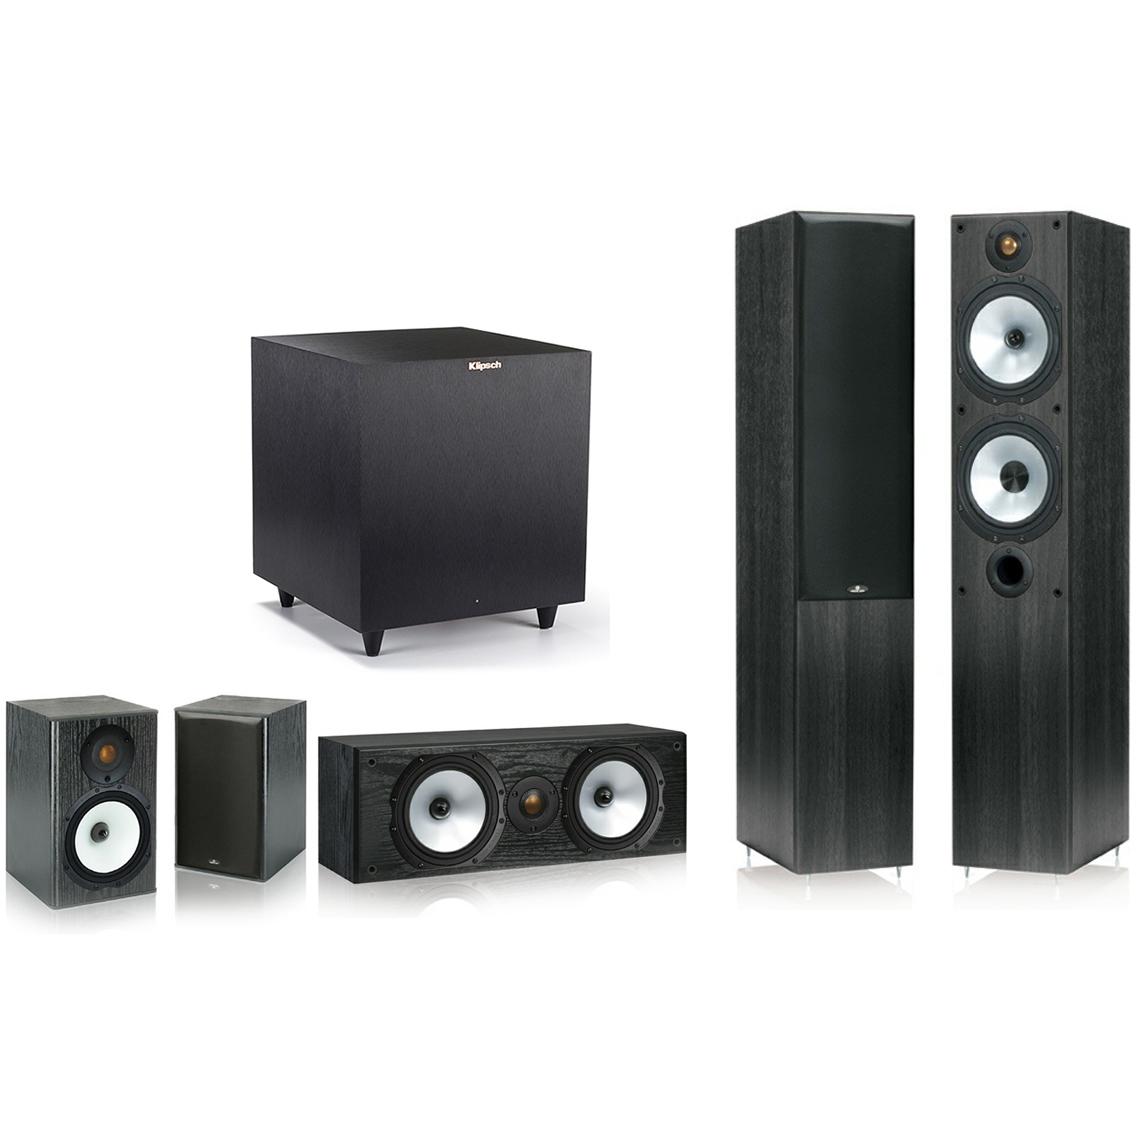 Monitor Audio Reference MR4 5.1 Paket - Ljudshopen ed933421e7b4c